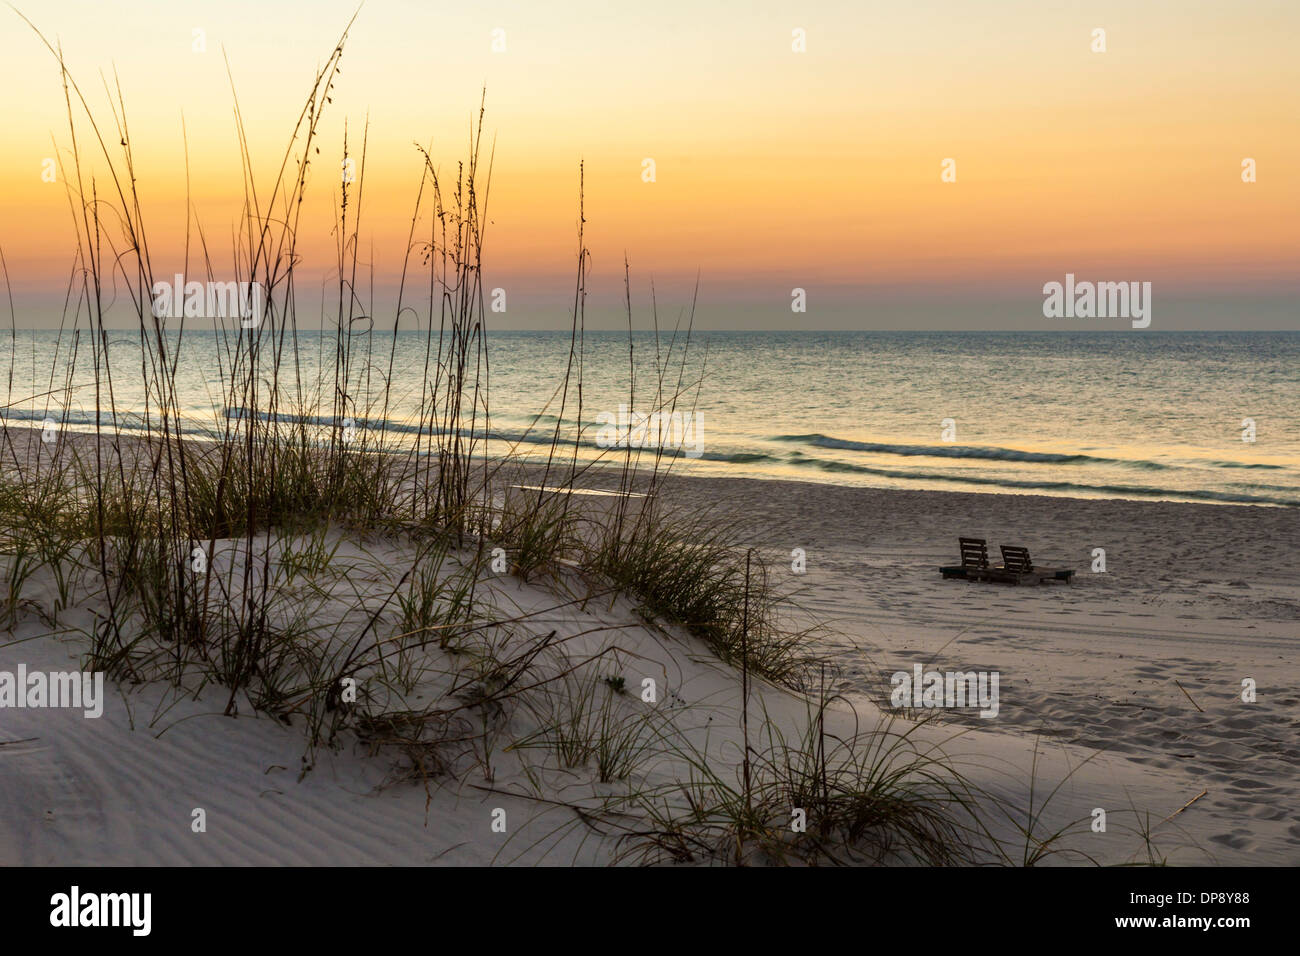 Sea oats on sand dunes at Gulf Shores Alabama beach - Stock Image